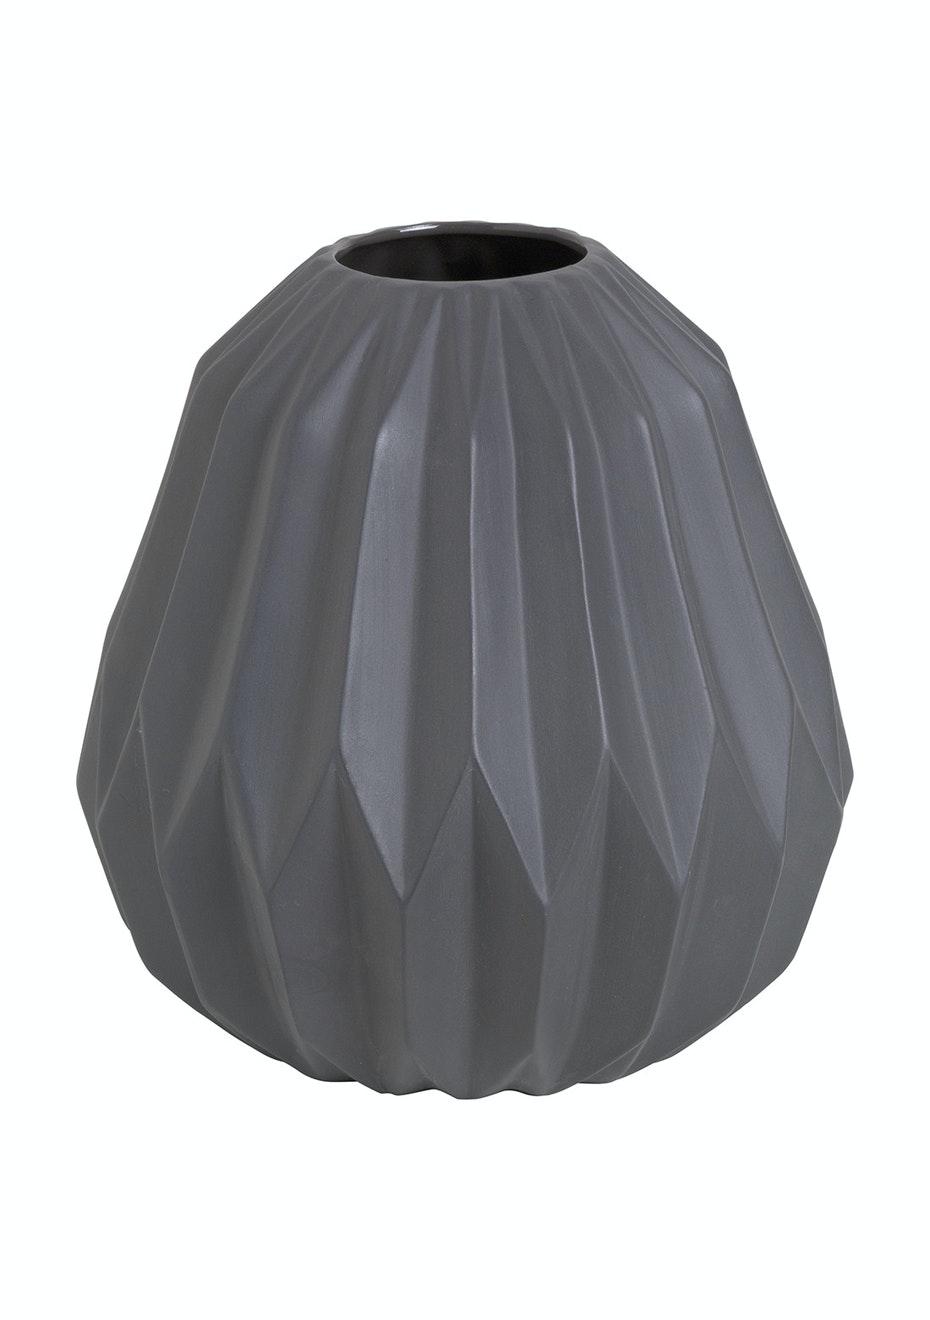 Jason - Geometric Vase - Charcoal